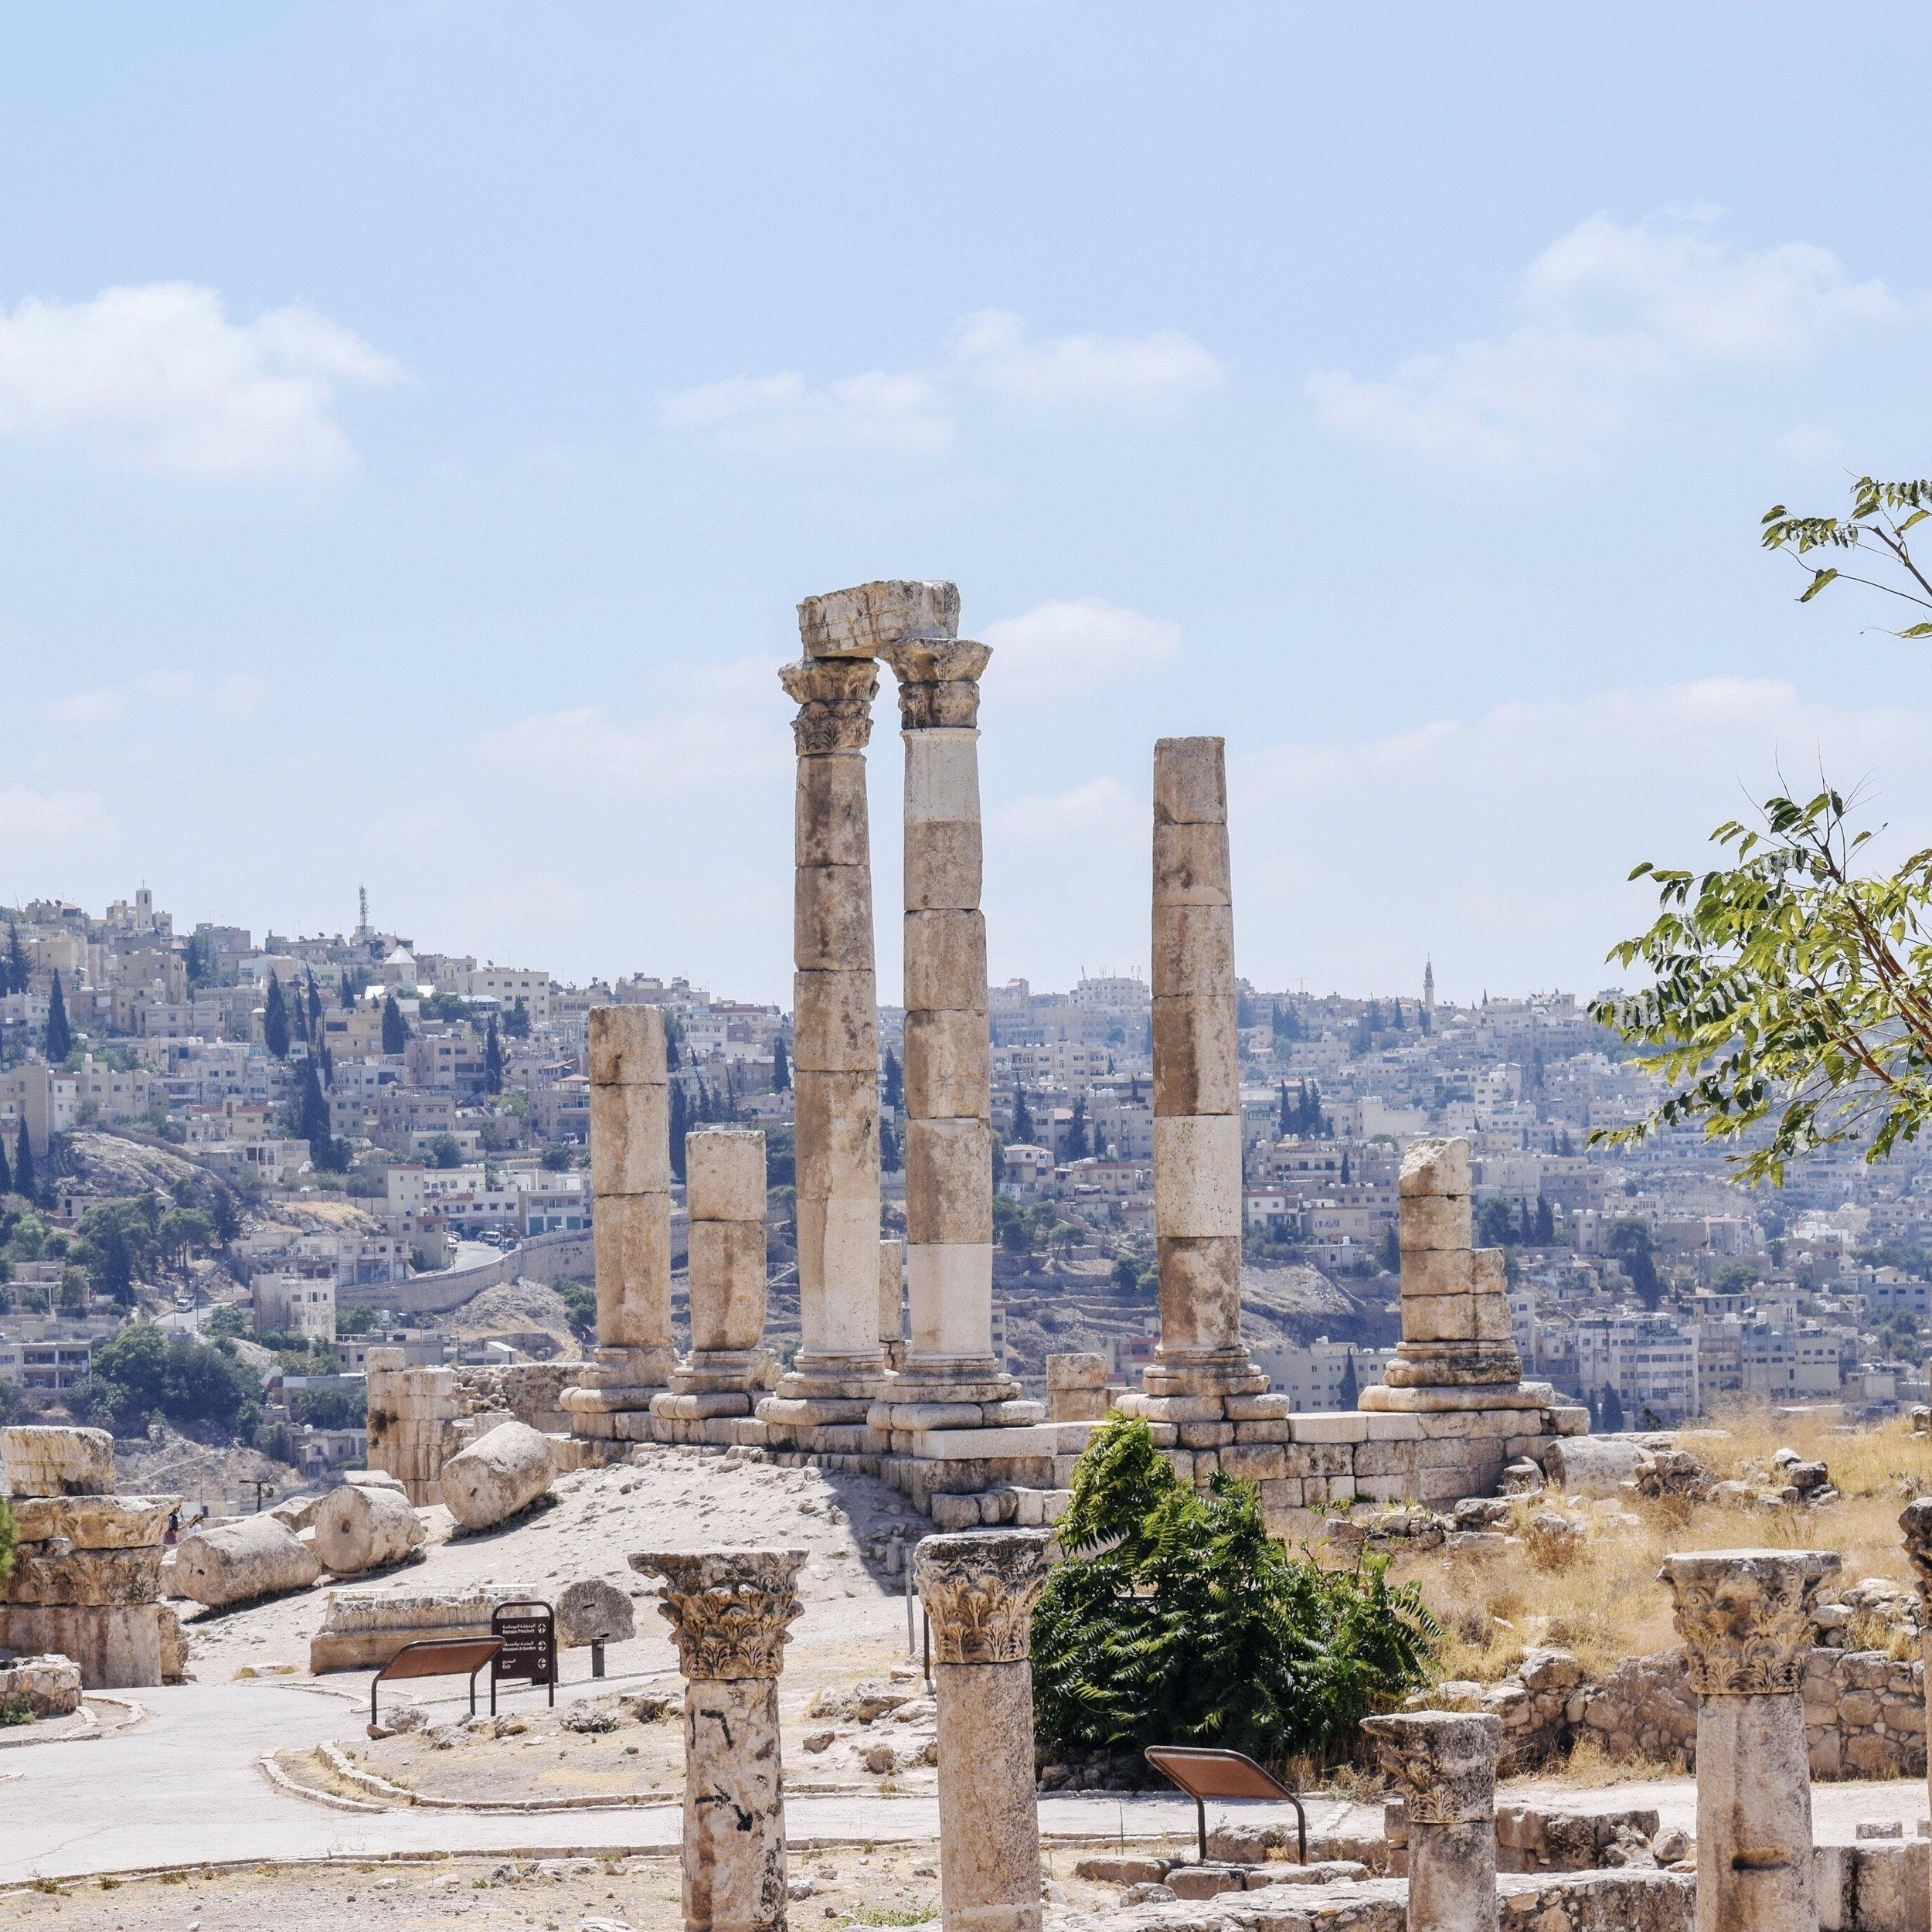 Citadel - Temple of Hercules